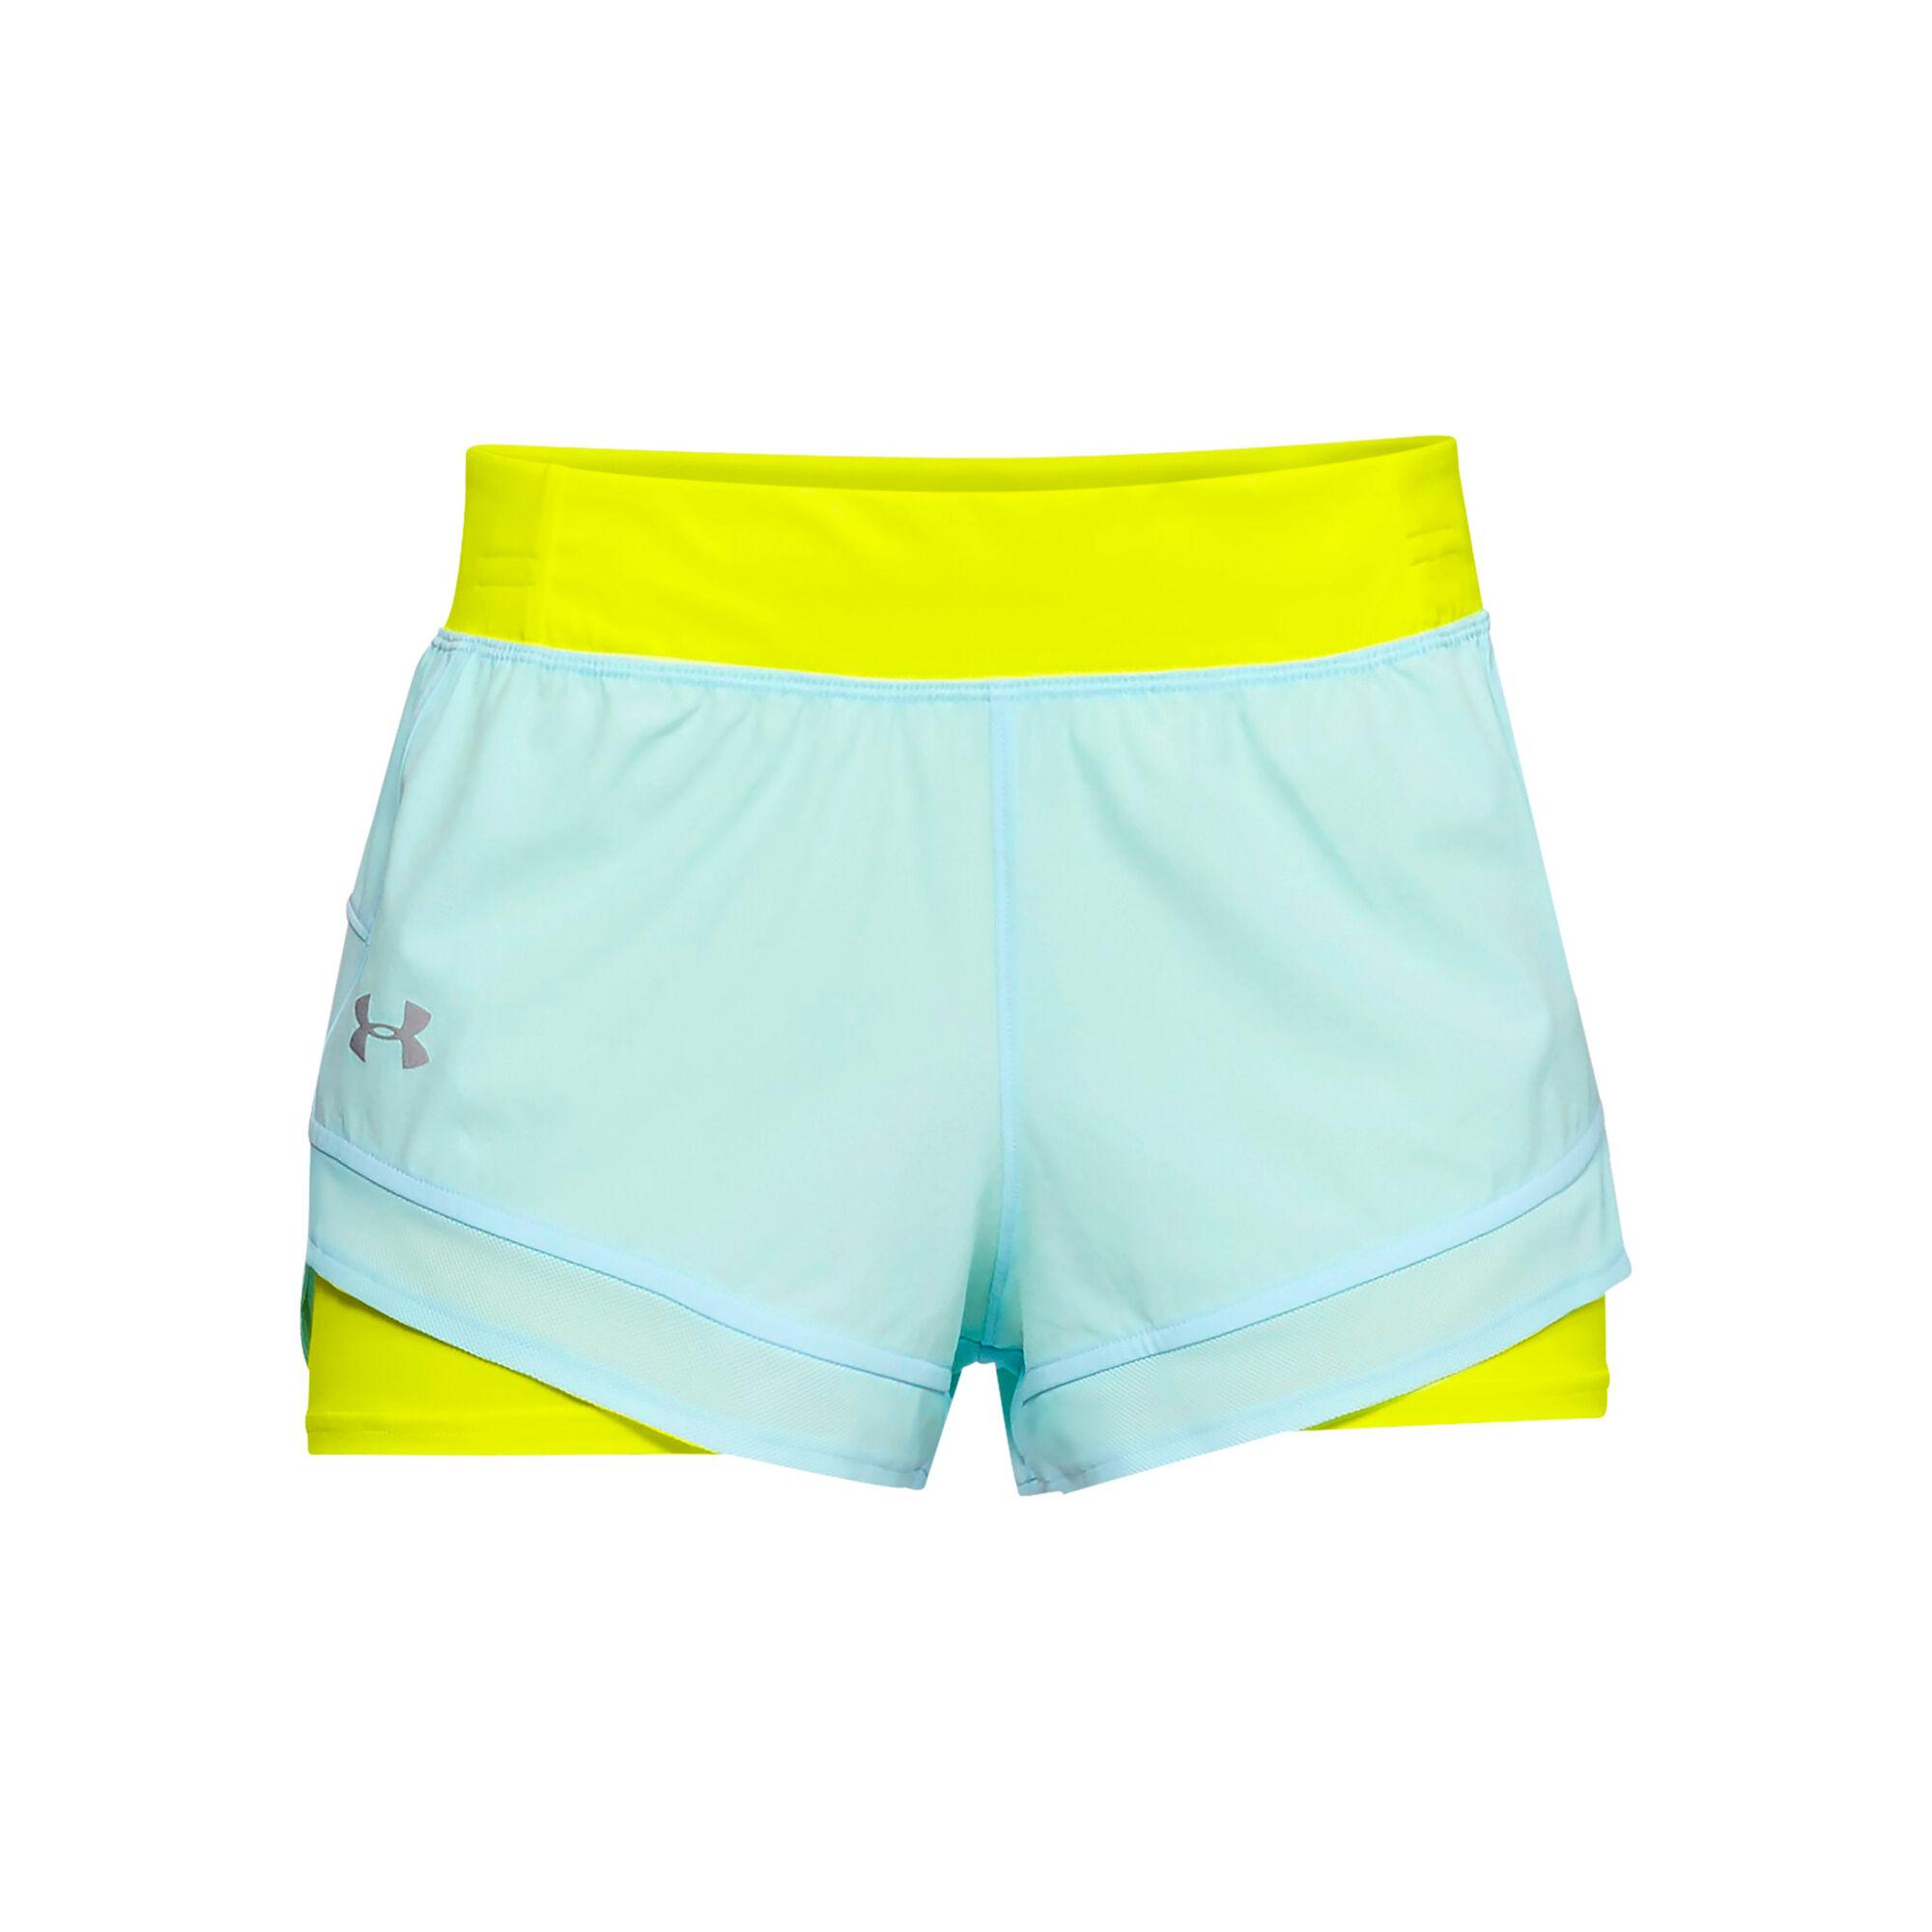 5555a873c3 buy Under Armour Qualifier Speed Pocket 2in1 Shorts Women - Light ...